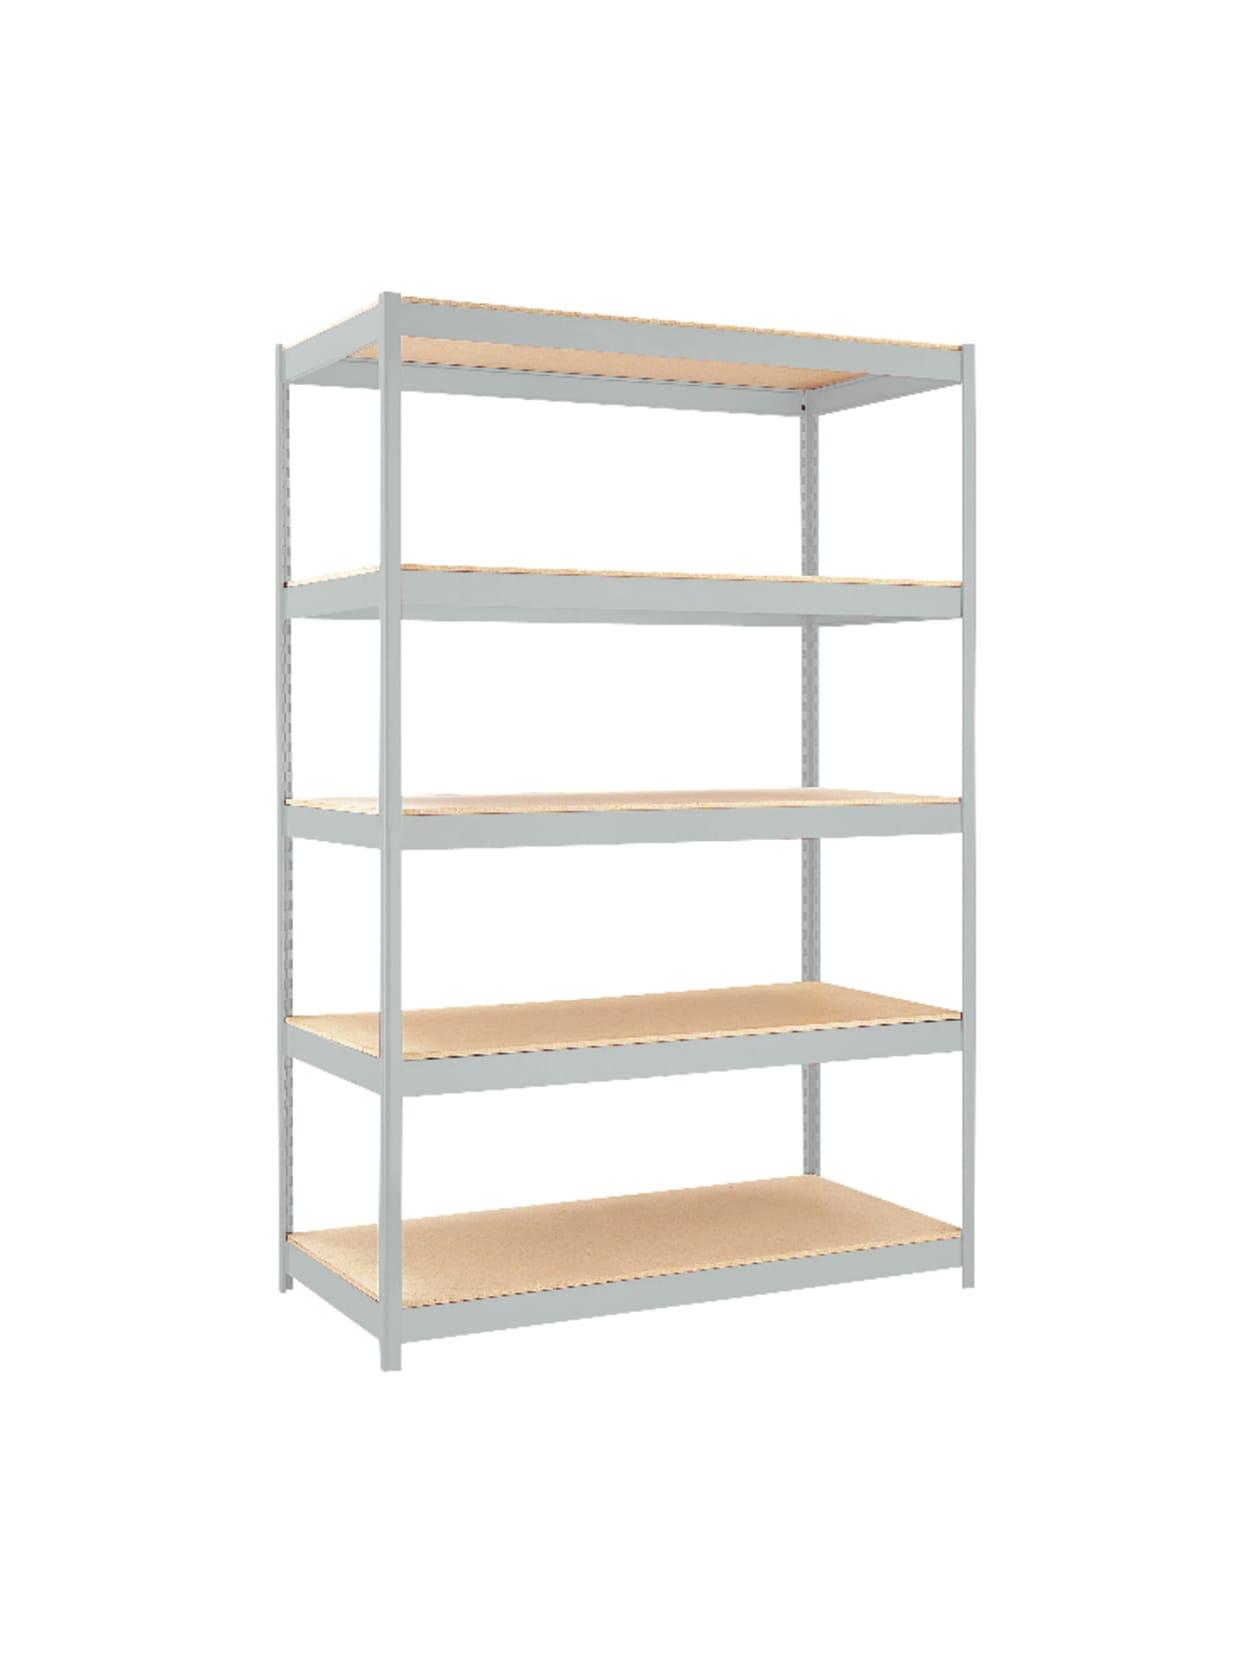 Hirsh Industries 1500 Series Steel Shelving 5 Shelves 48 W Gray Office Depot